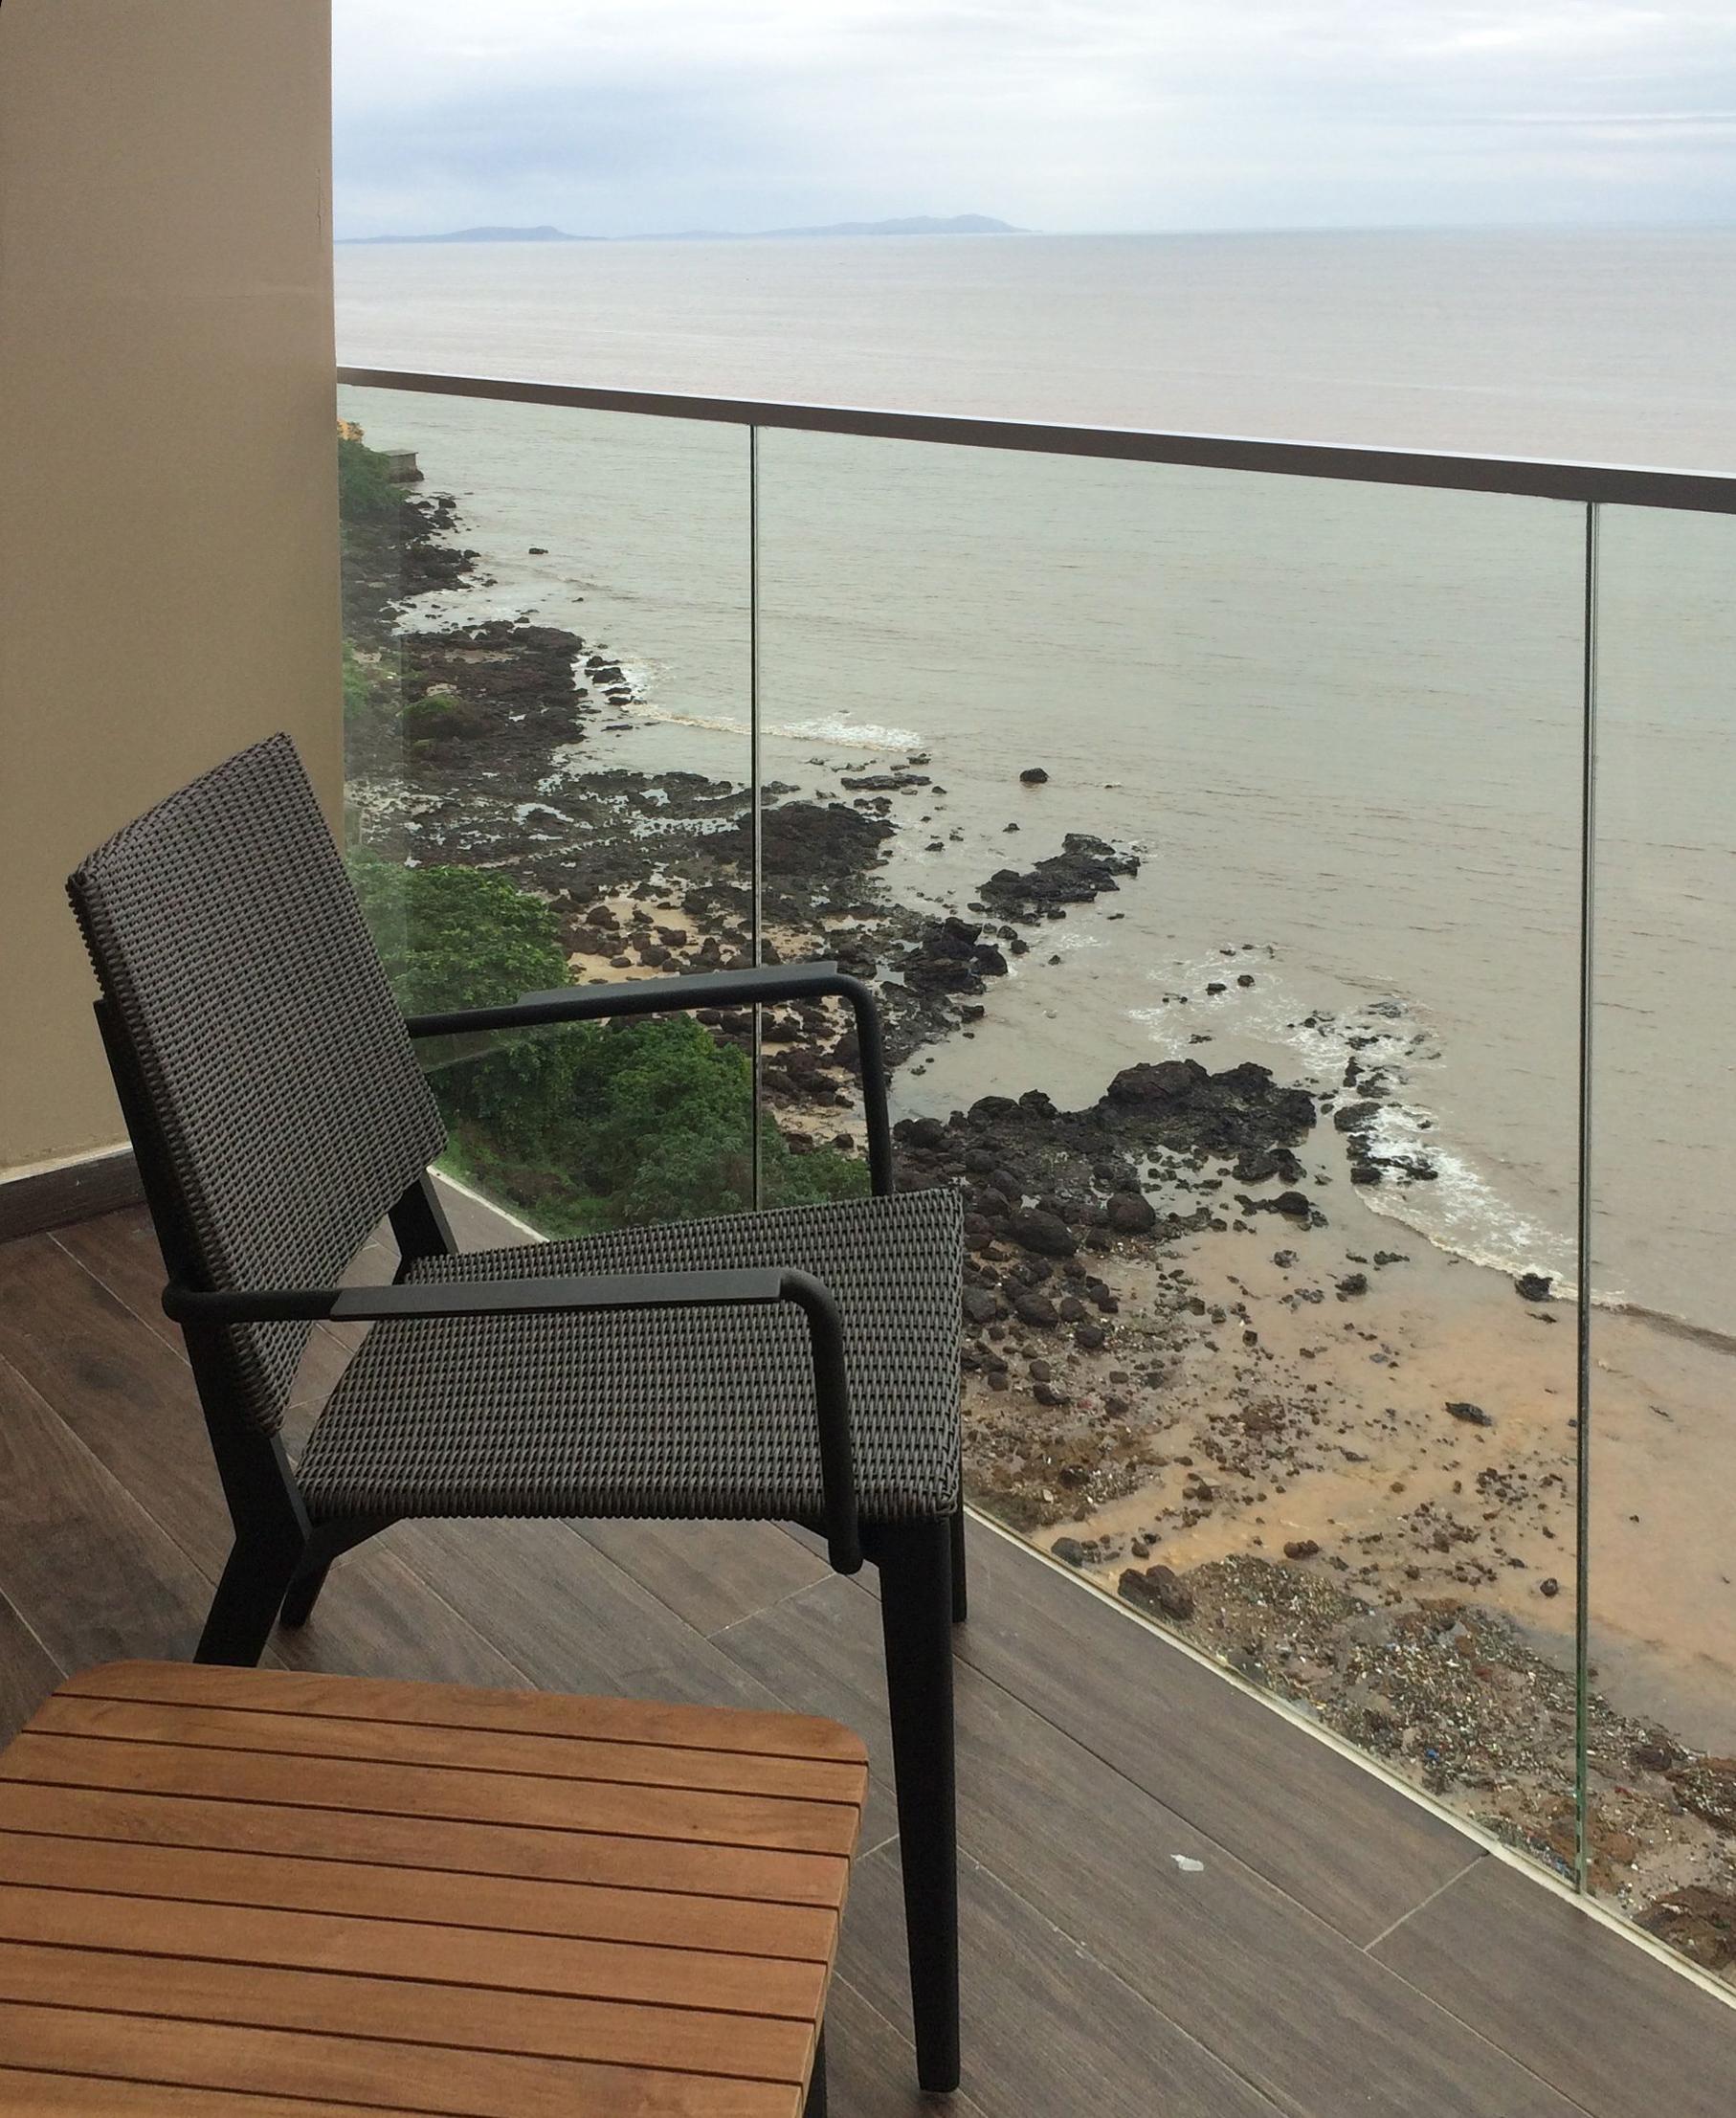 Cobico_Sheraton Conakry_King Balcony view.jpg